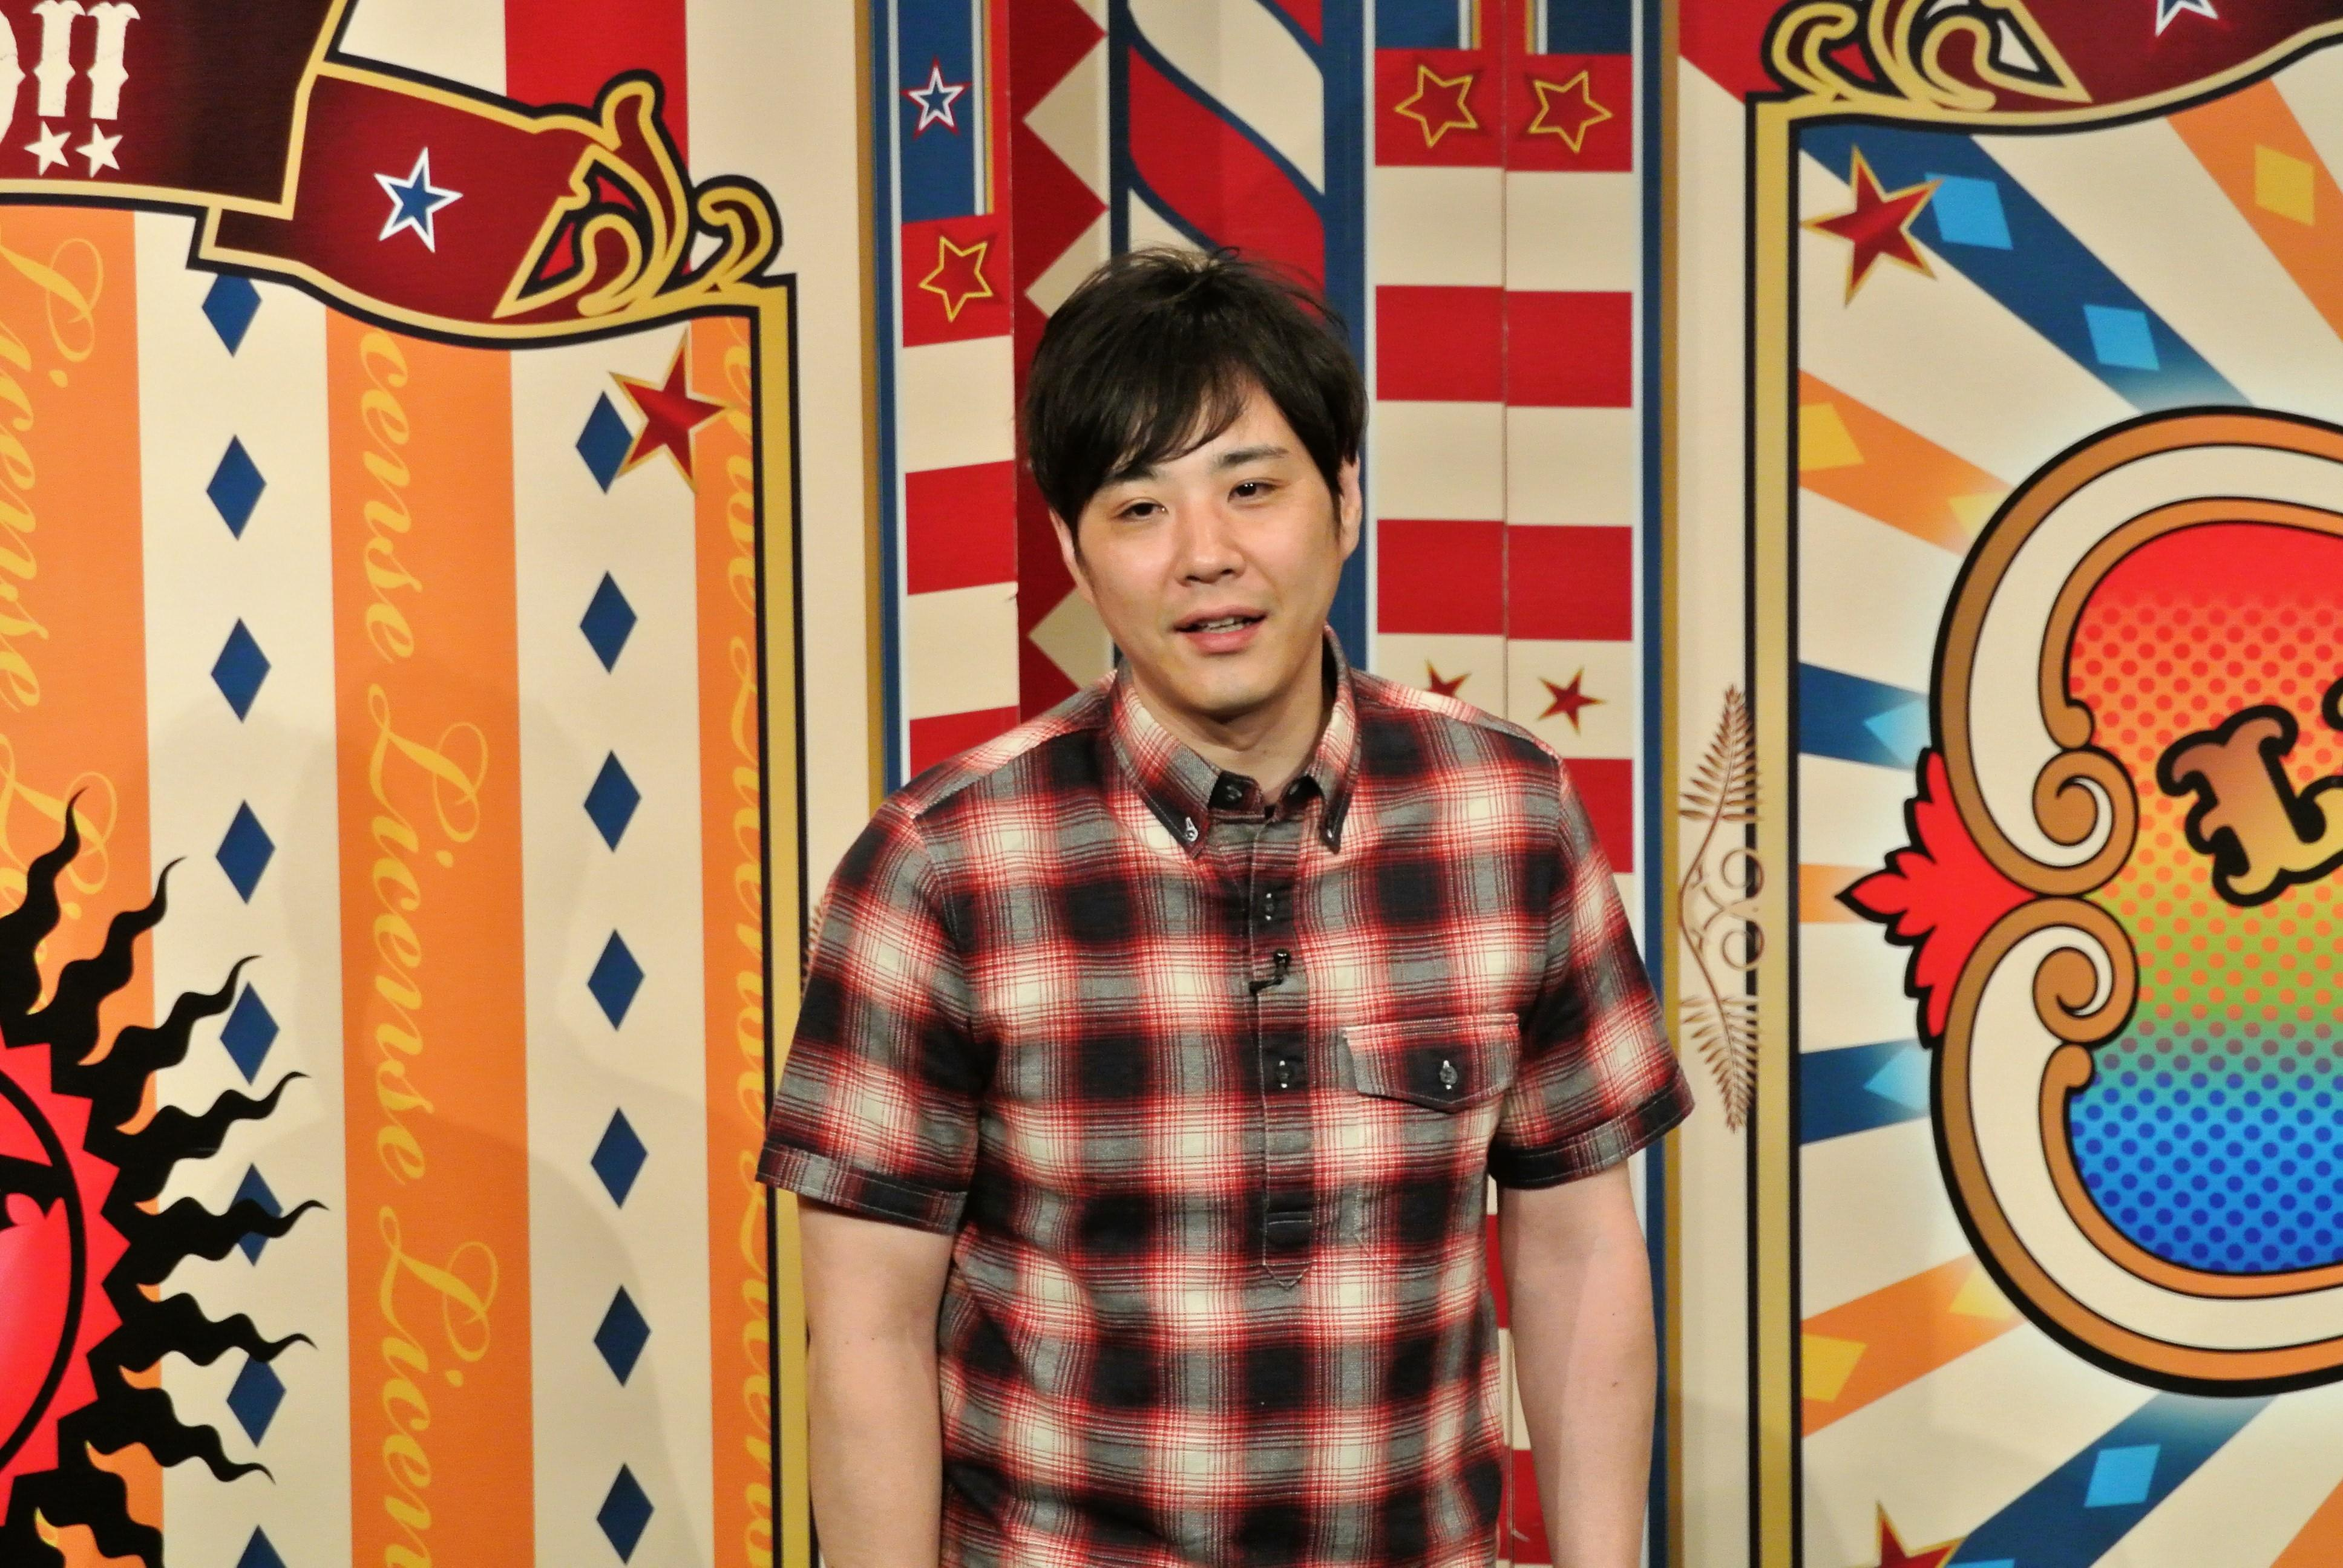 http://news.yoshimoto.co.jp/20170730194534-b83360c59f8d927920f8dff643499ed3a8ded92a.jpg